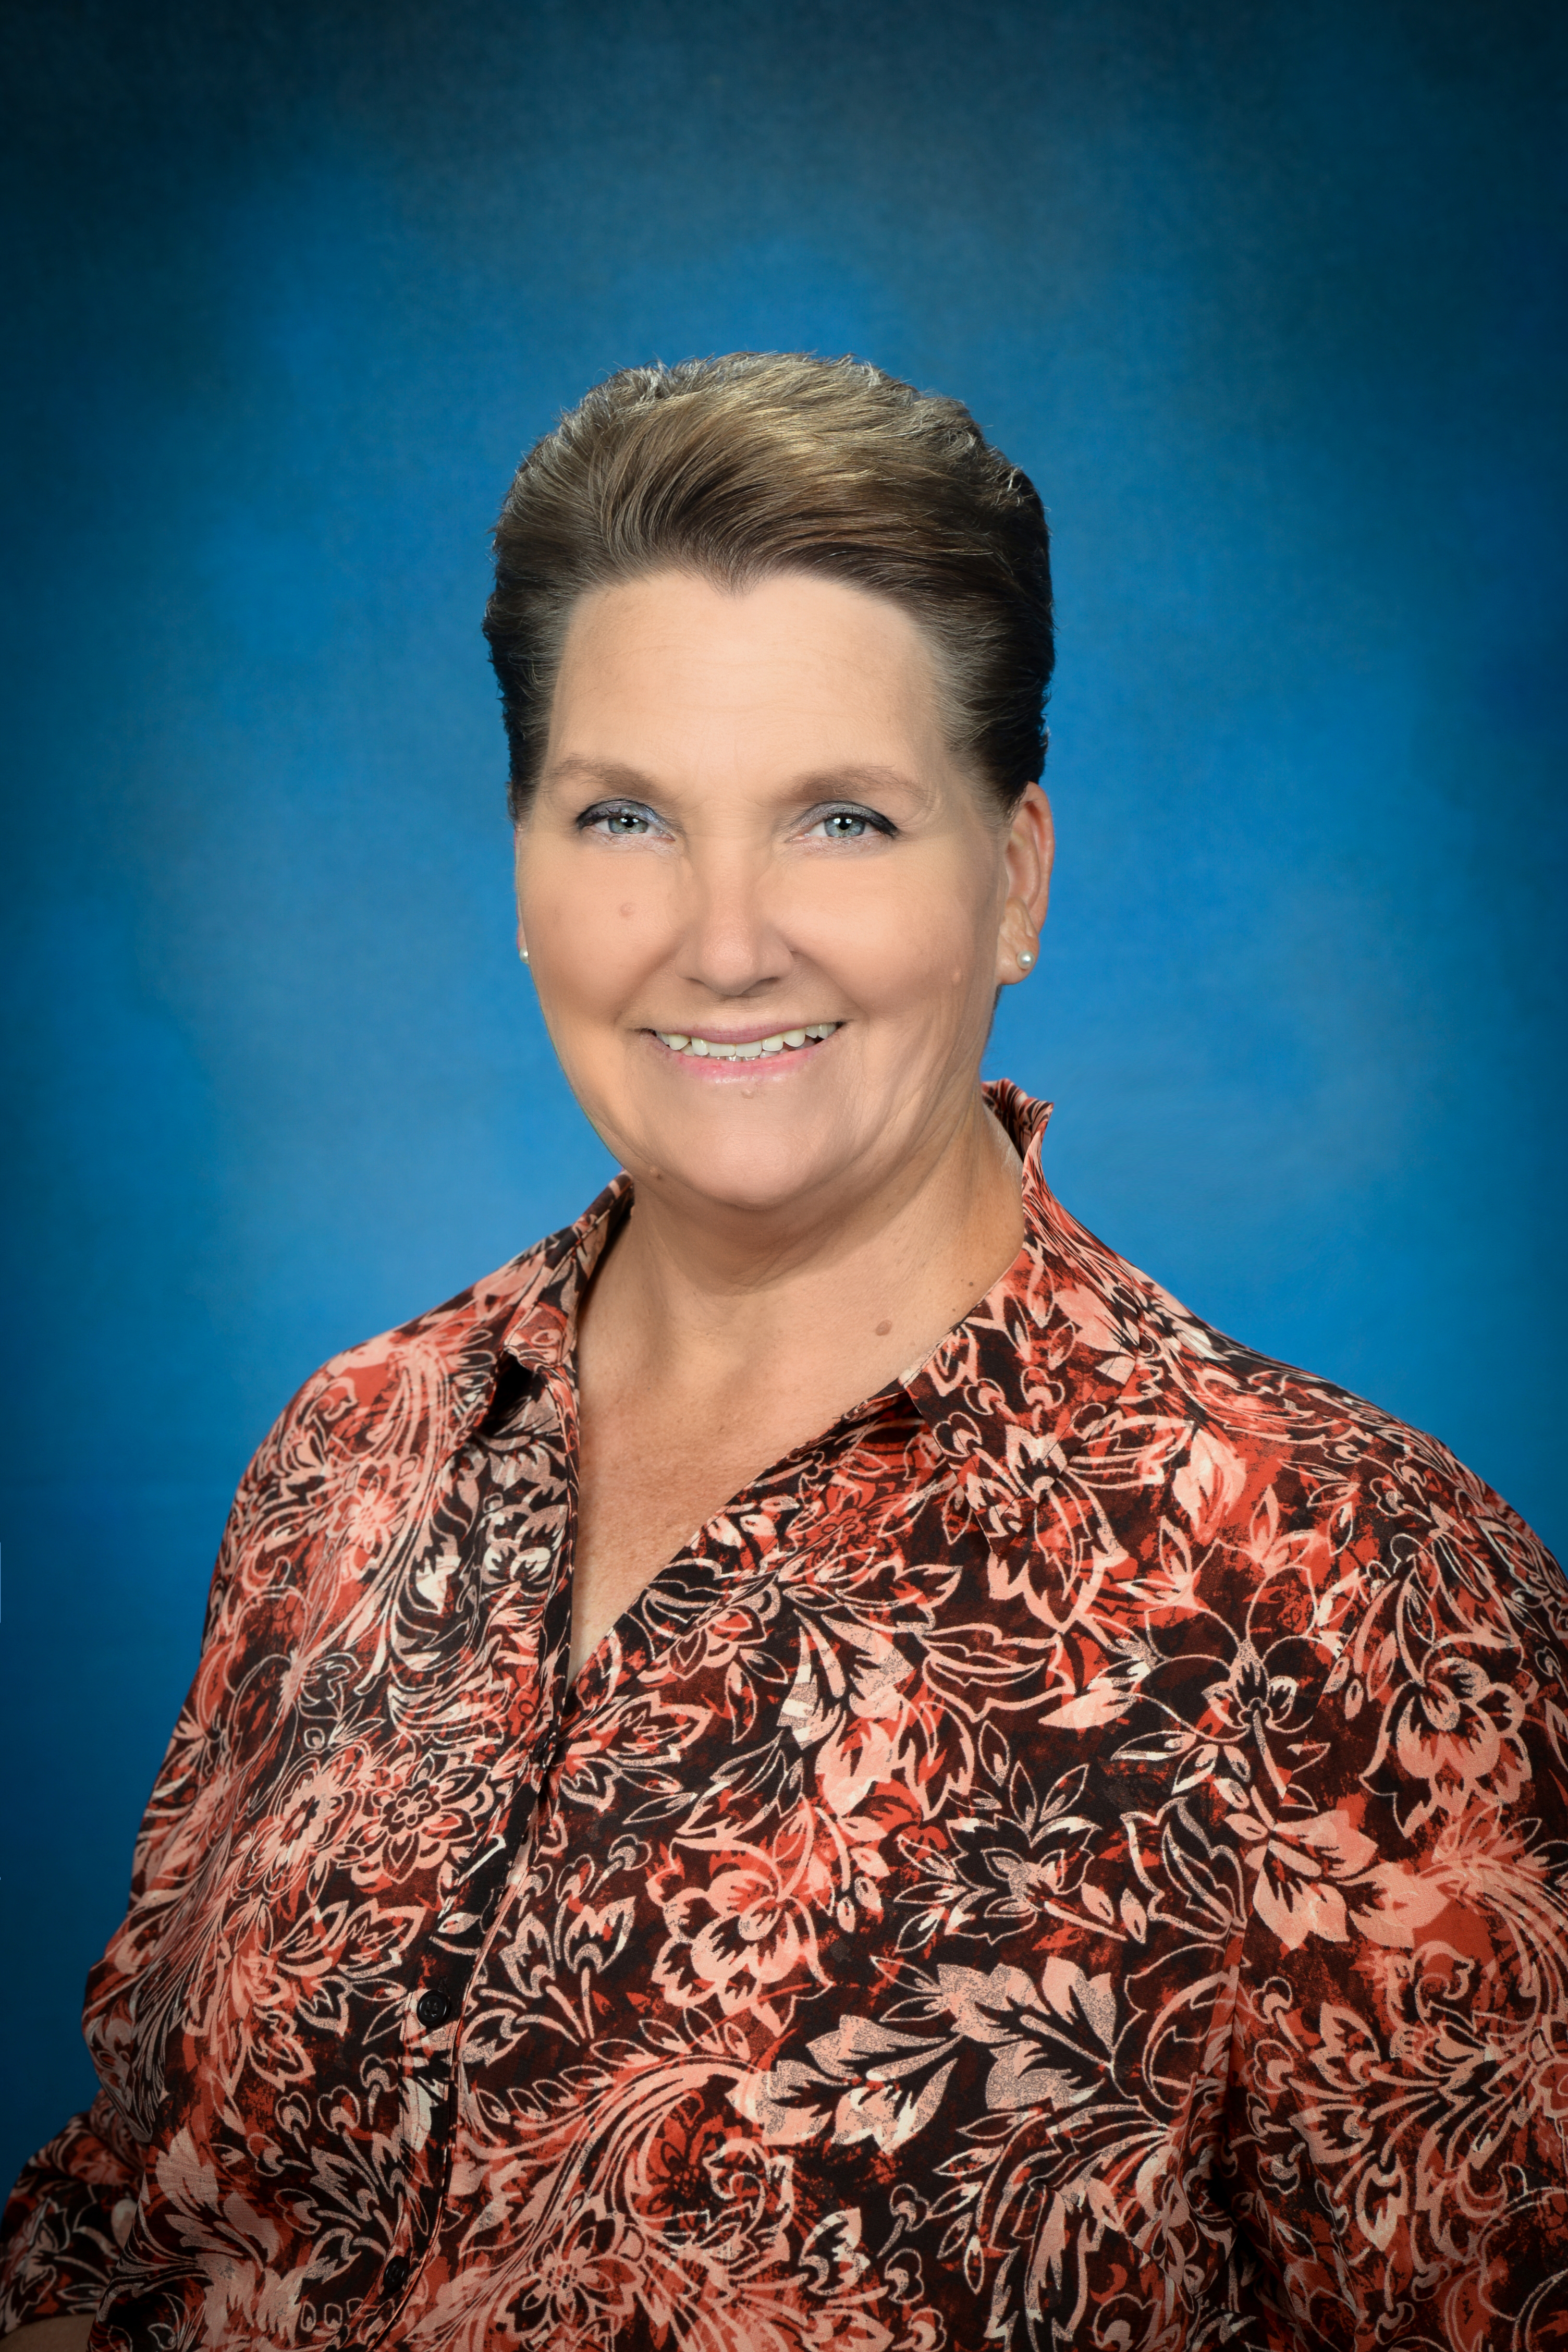 Cathy Dobbs, Principal